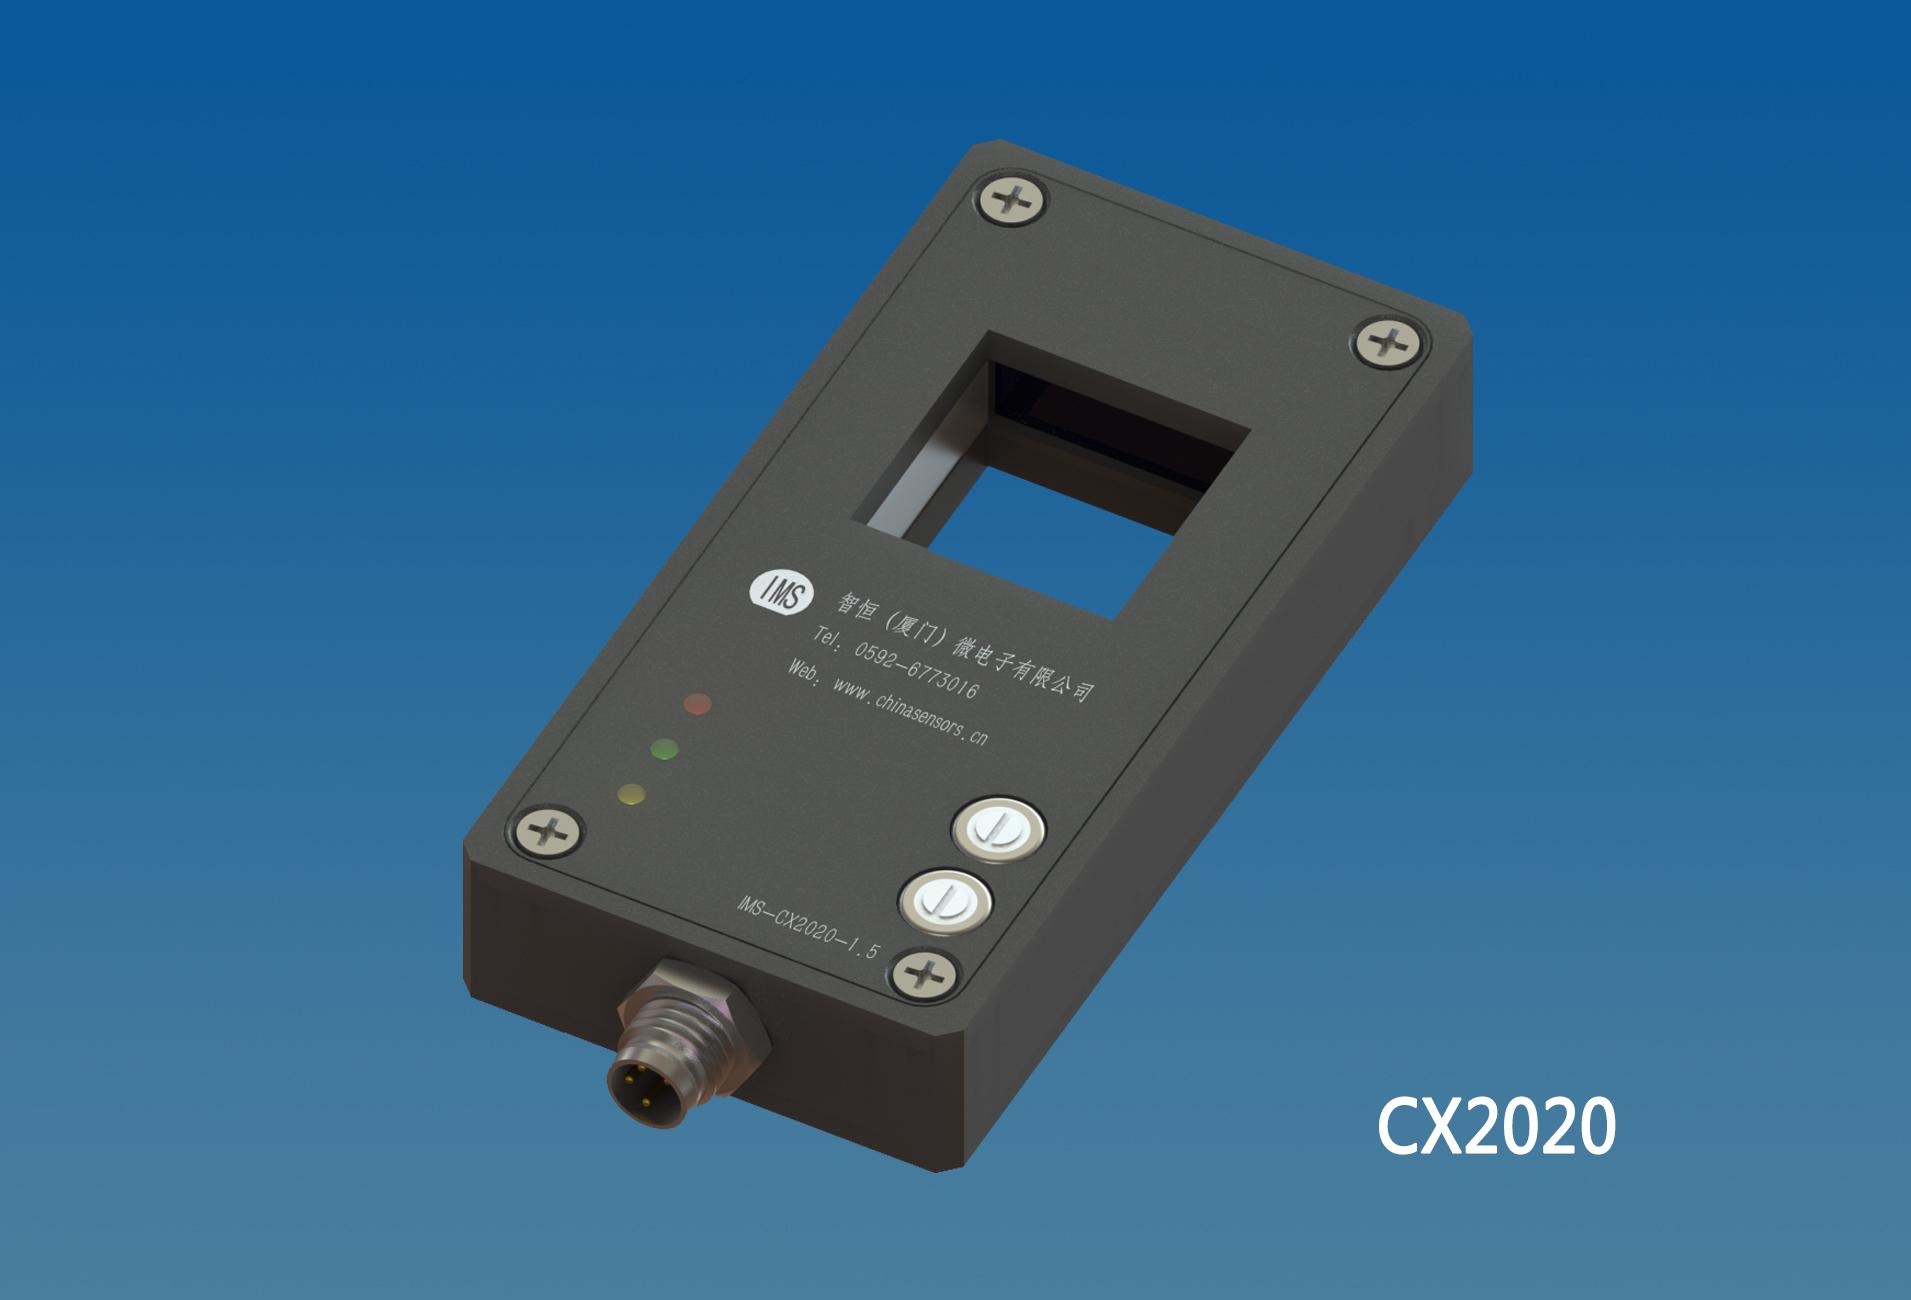 CX2020